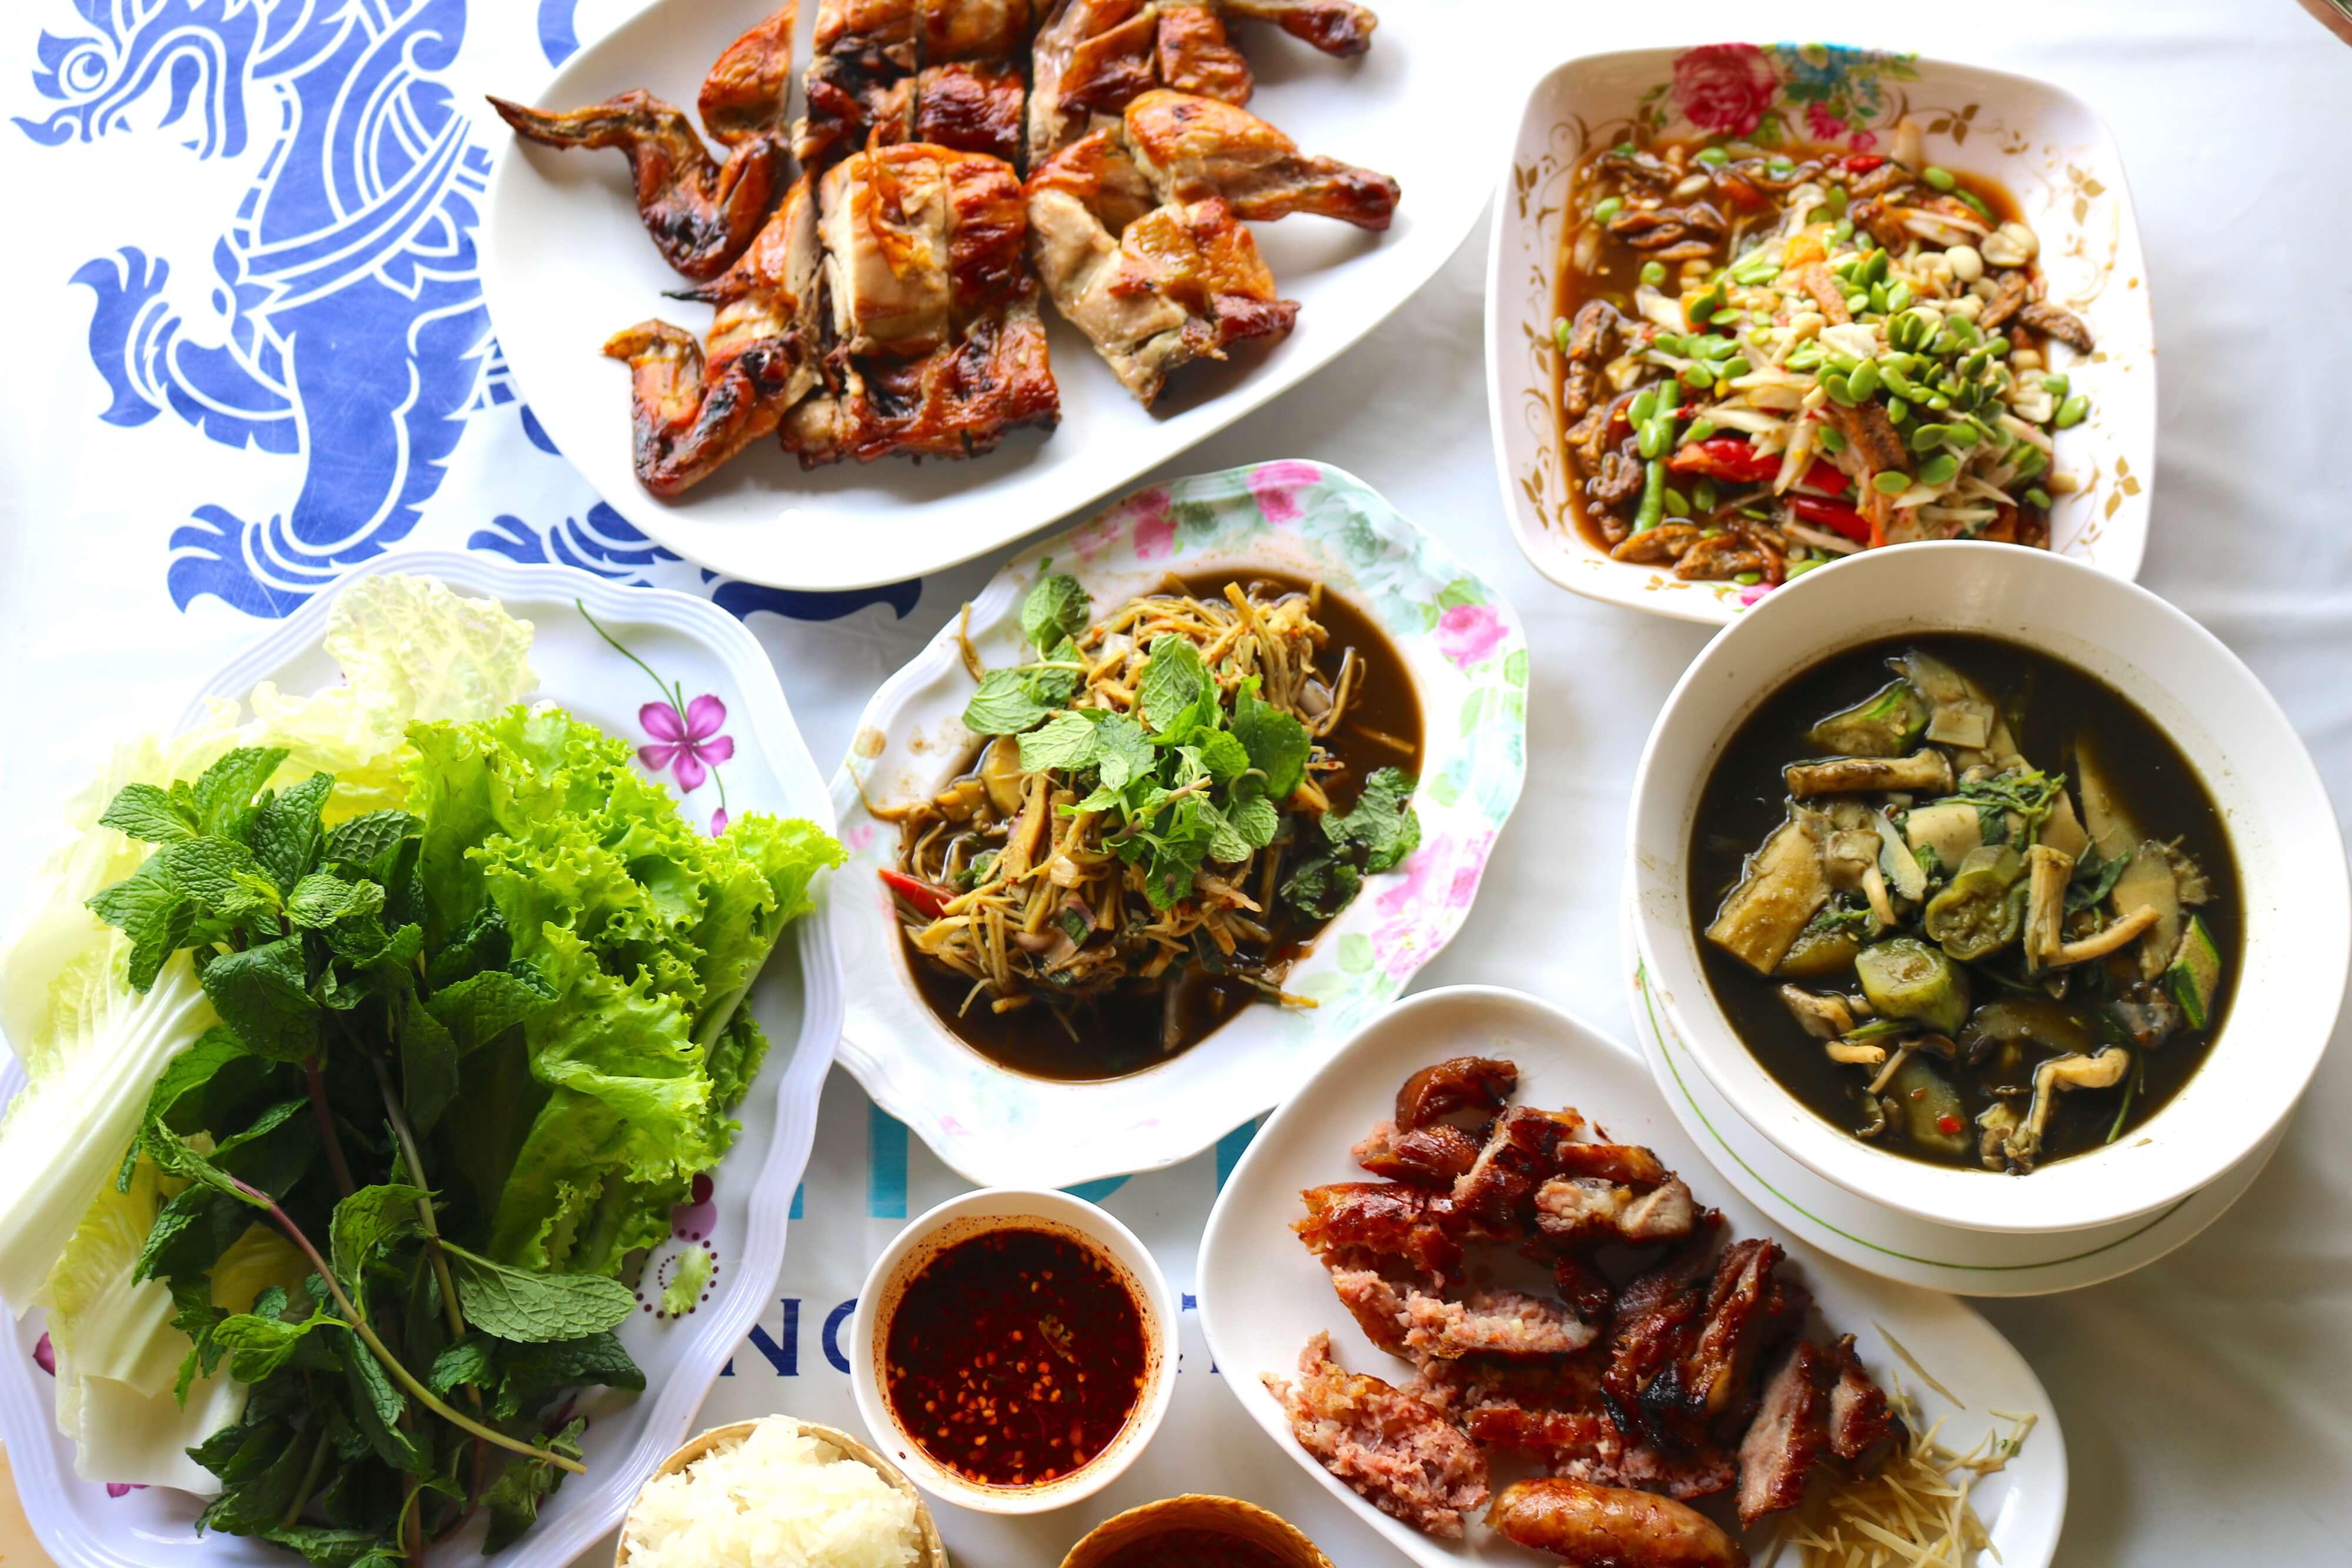 Gai Yang Preecha is in Khon Kaen, in a great location near the Khon Kaen University